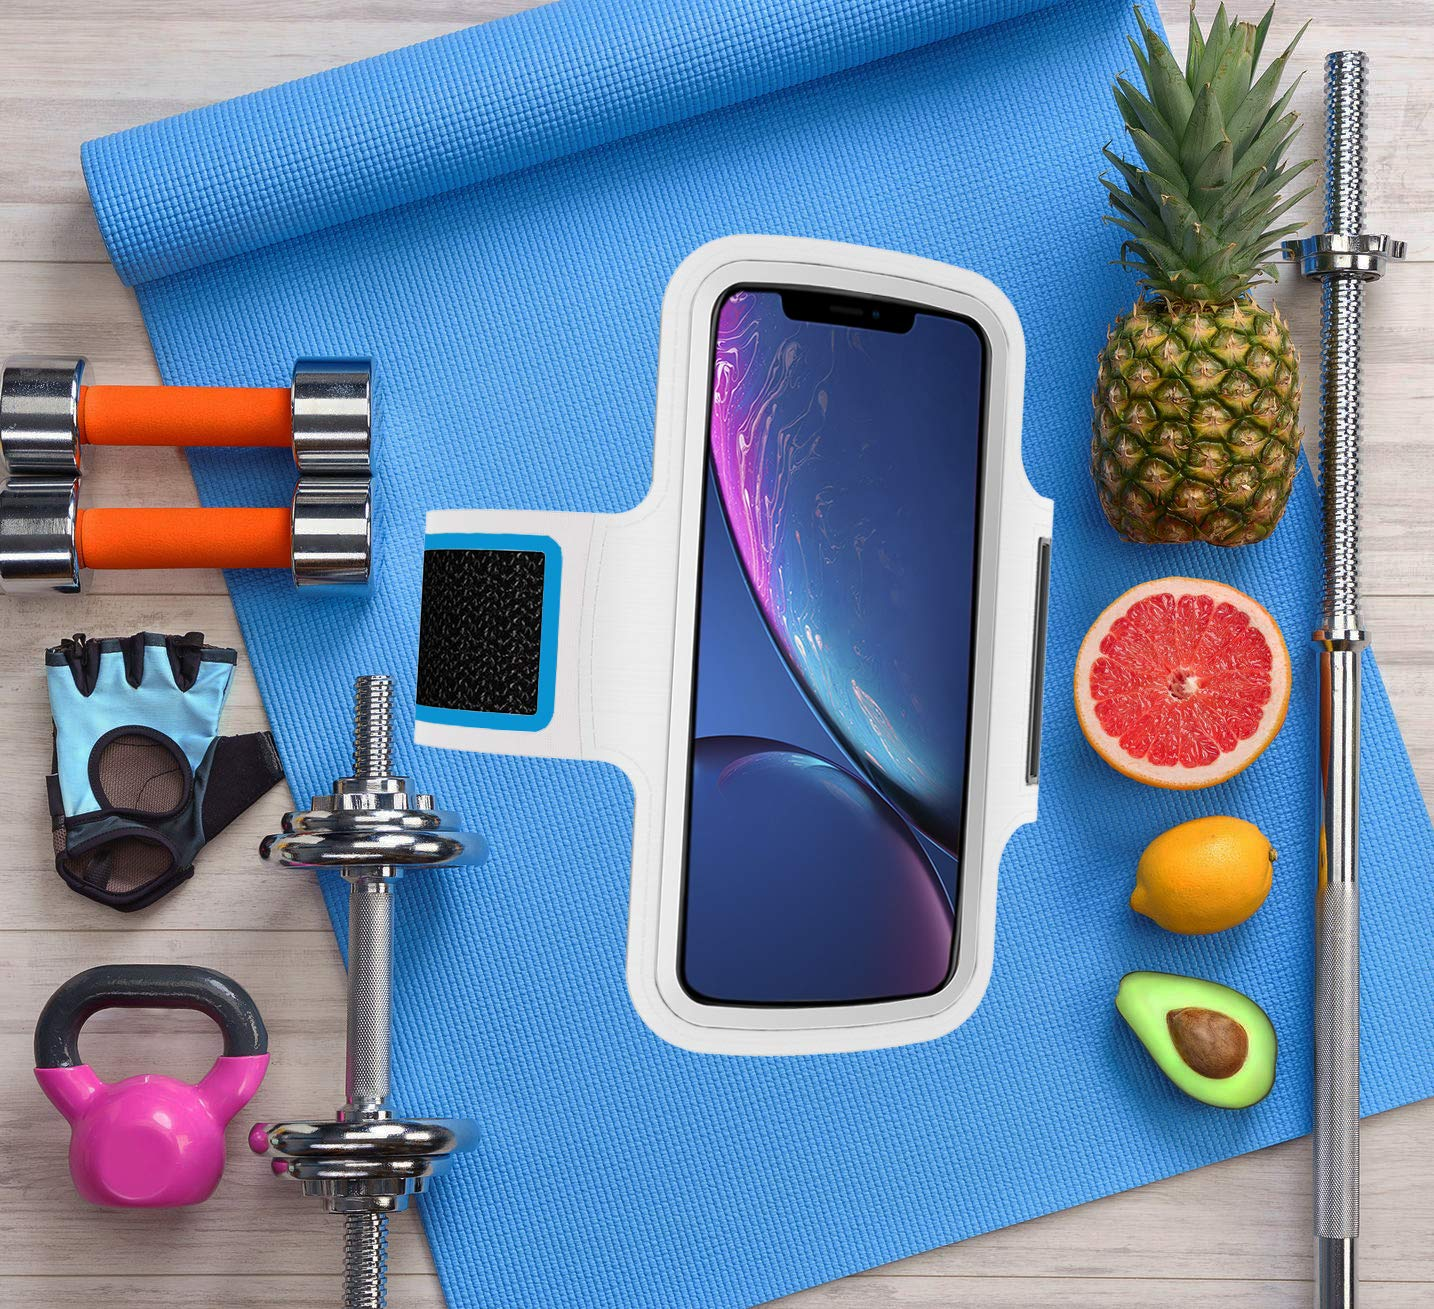 Rosa Brazalete Deportivo movil Compatible con Samsung Galaxy A70 Running Deporte Funda Banda Deportiva Transpirable Bolsillo para Llaves Cables Auriculares Tarjetas